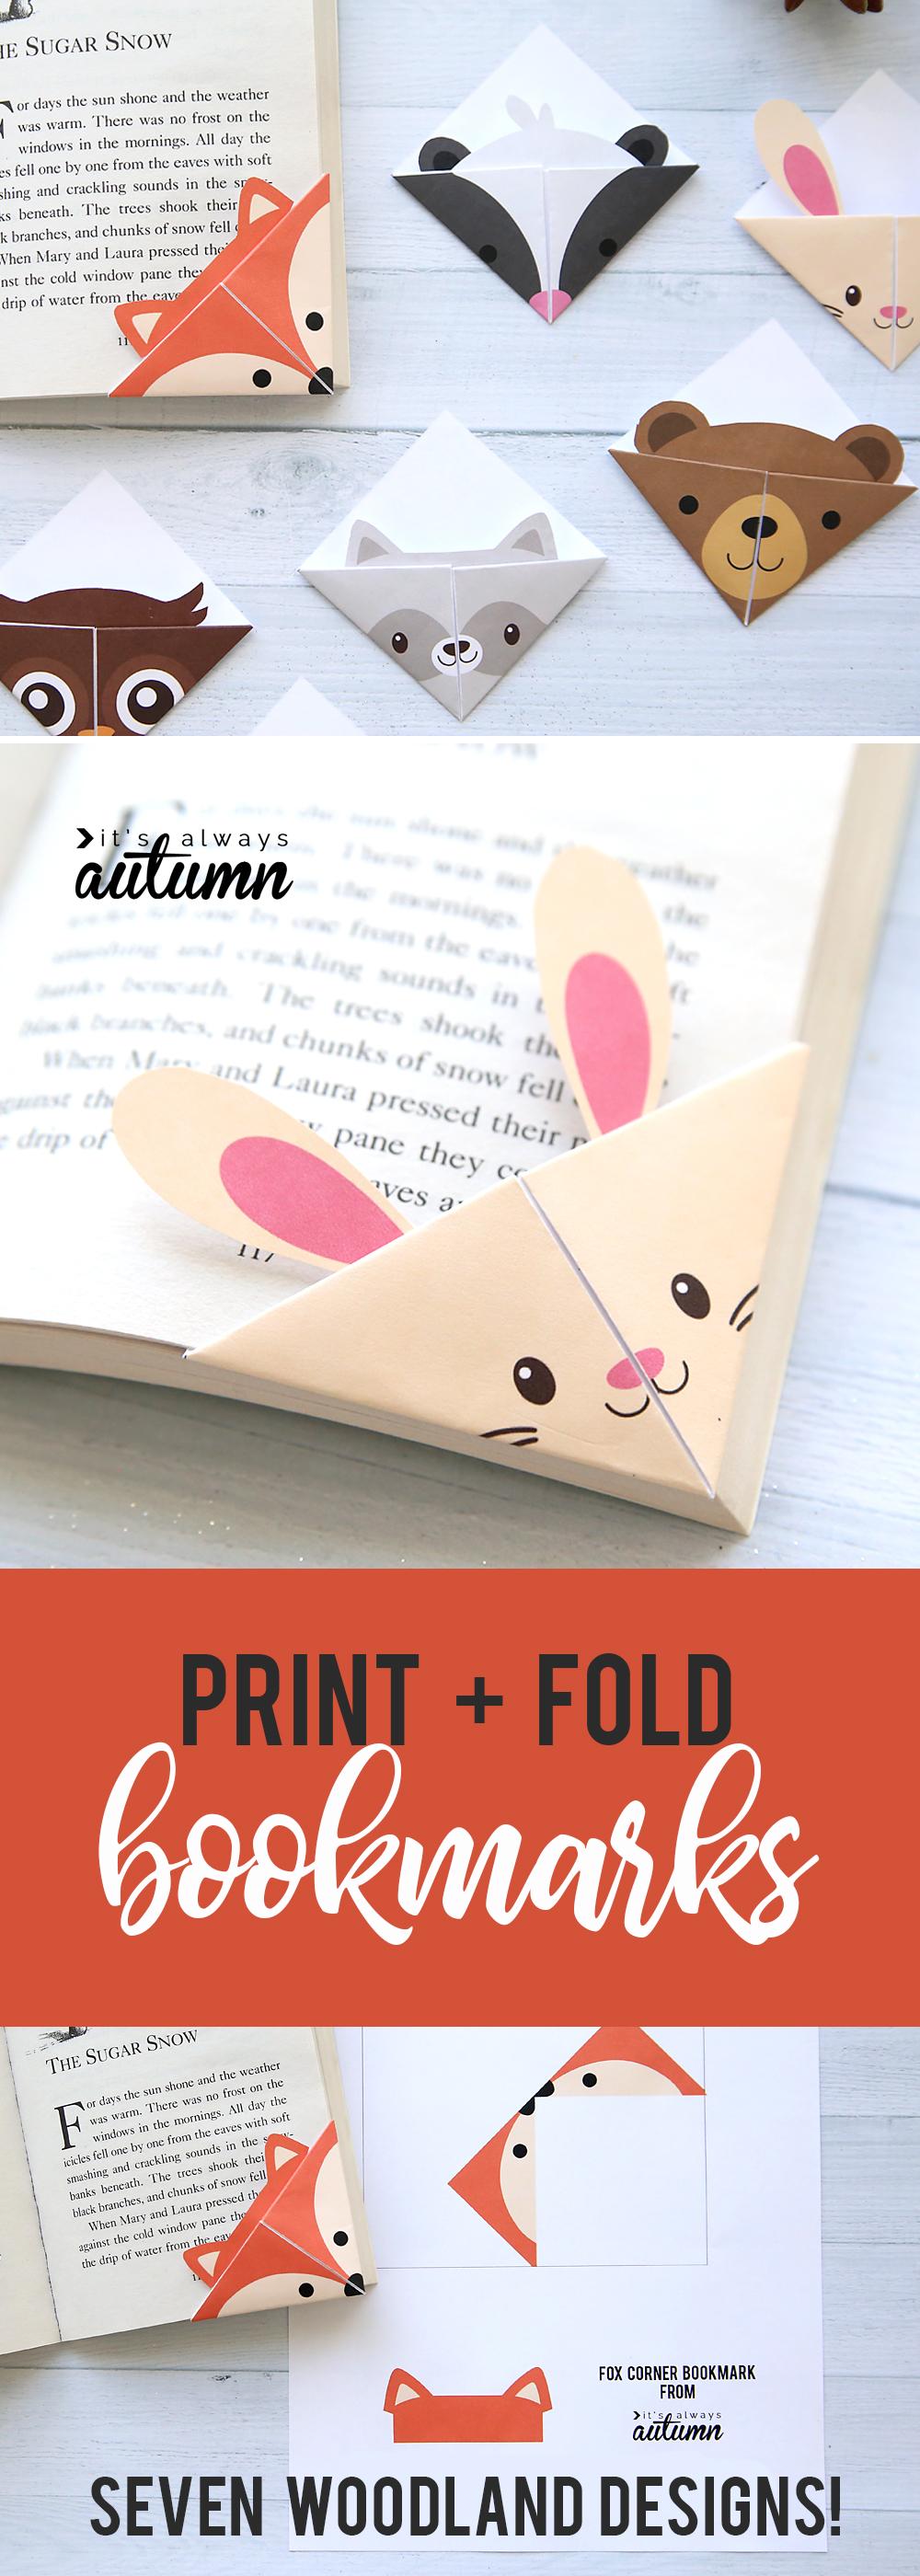 how-to-make-origami-bookmark-corner-bookmark-woodland-creatures-free-printable-1.jpg